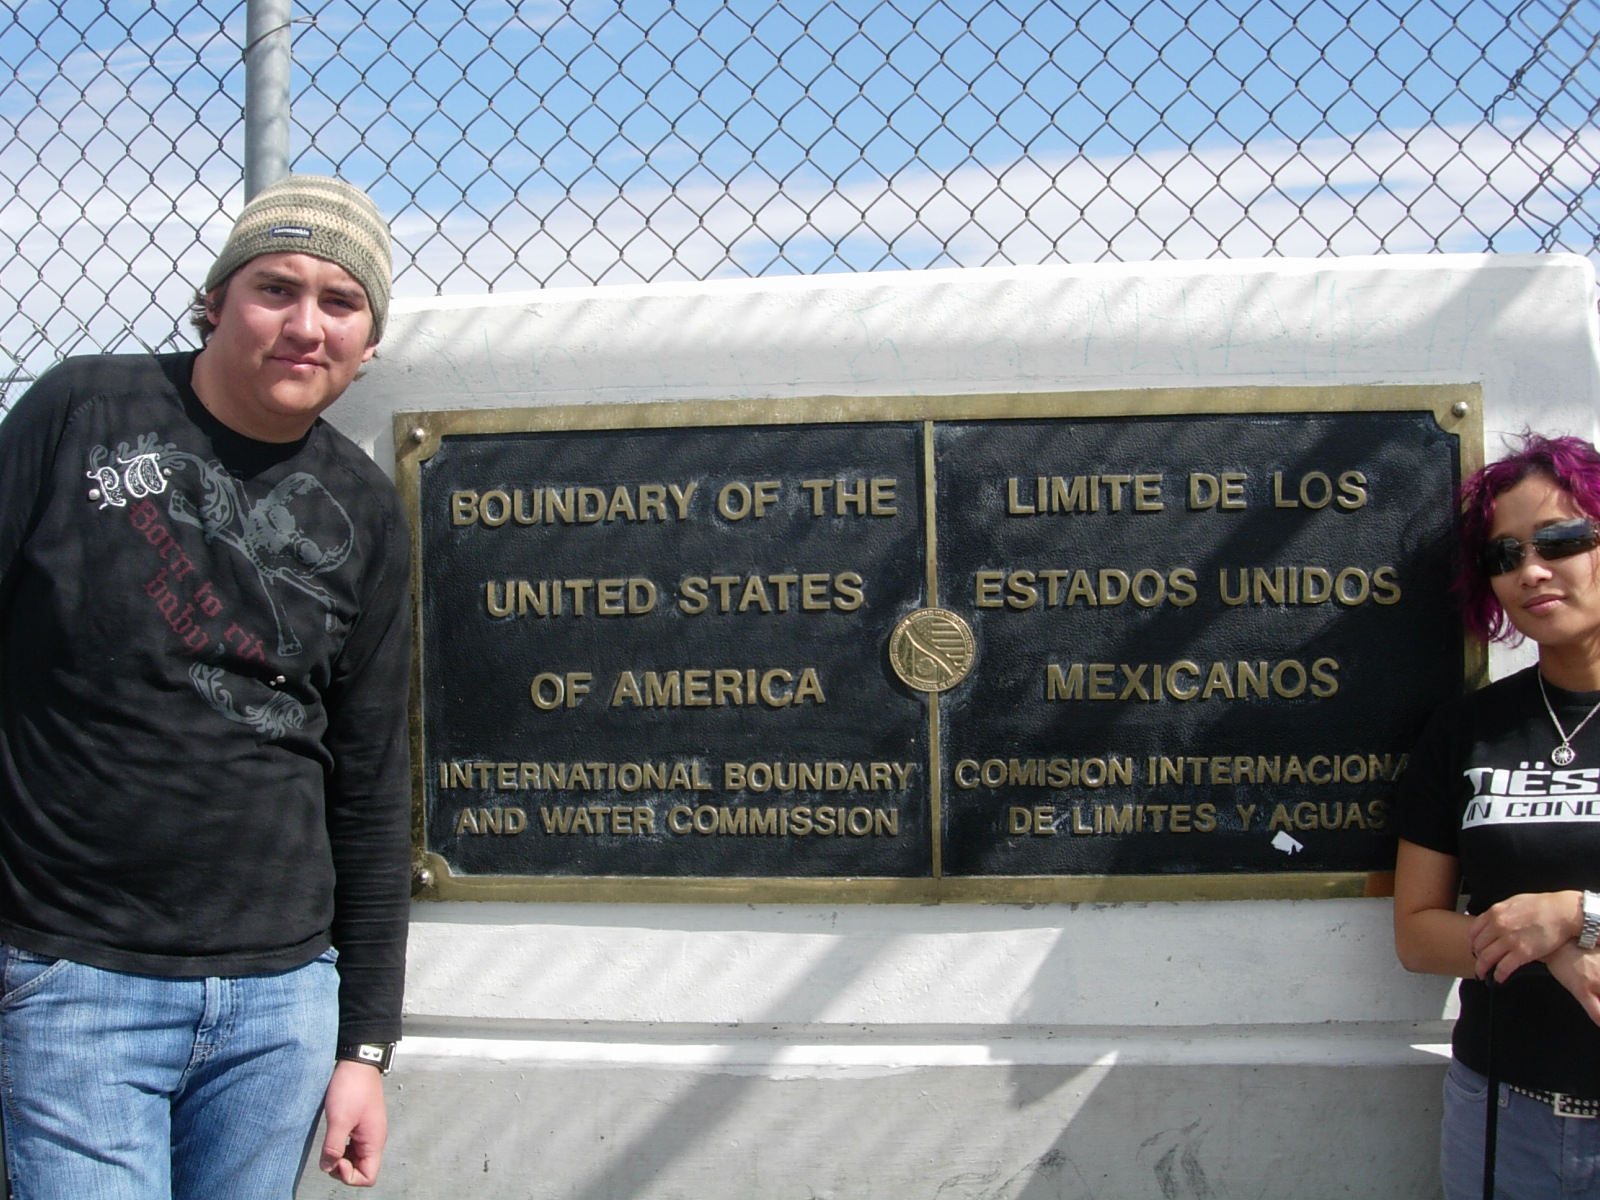 Of Mexico USA - Usa and mexico